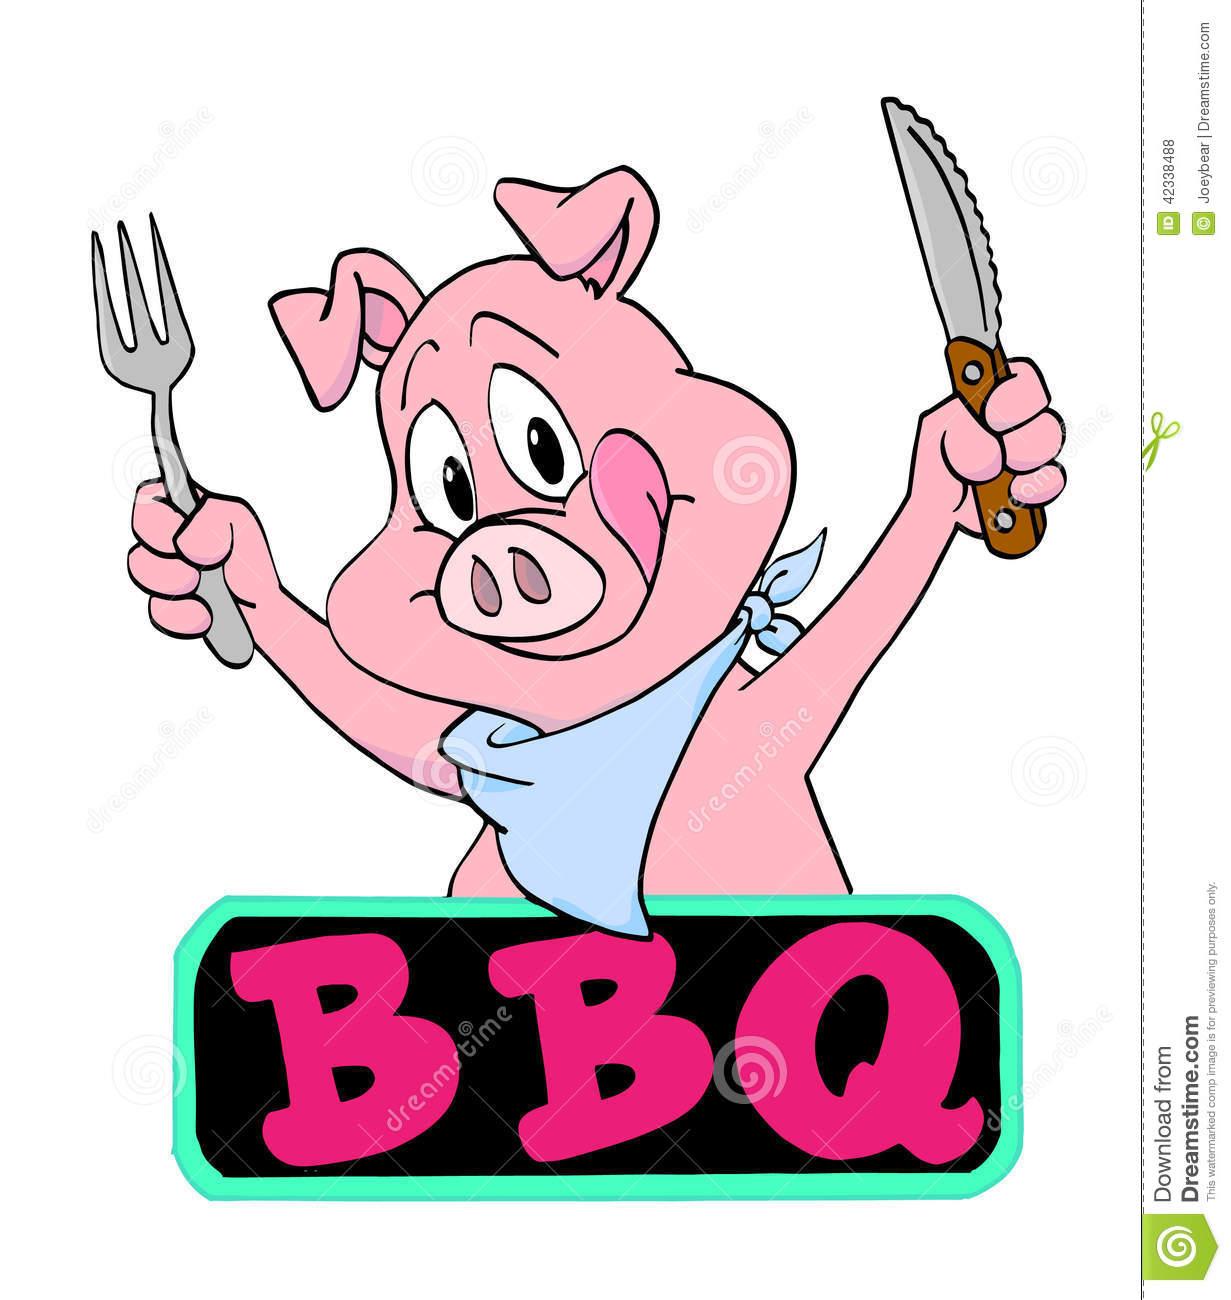 Pig clipart pig bbq Ser + pig Clipart Bbq